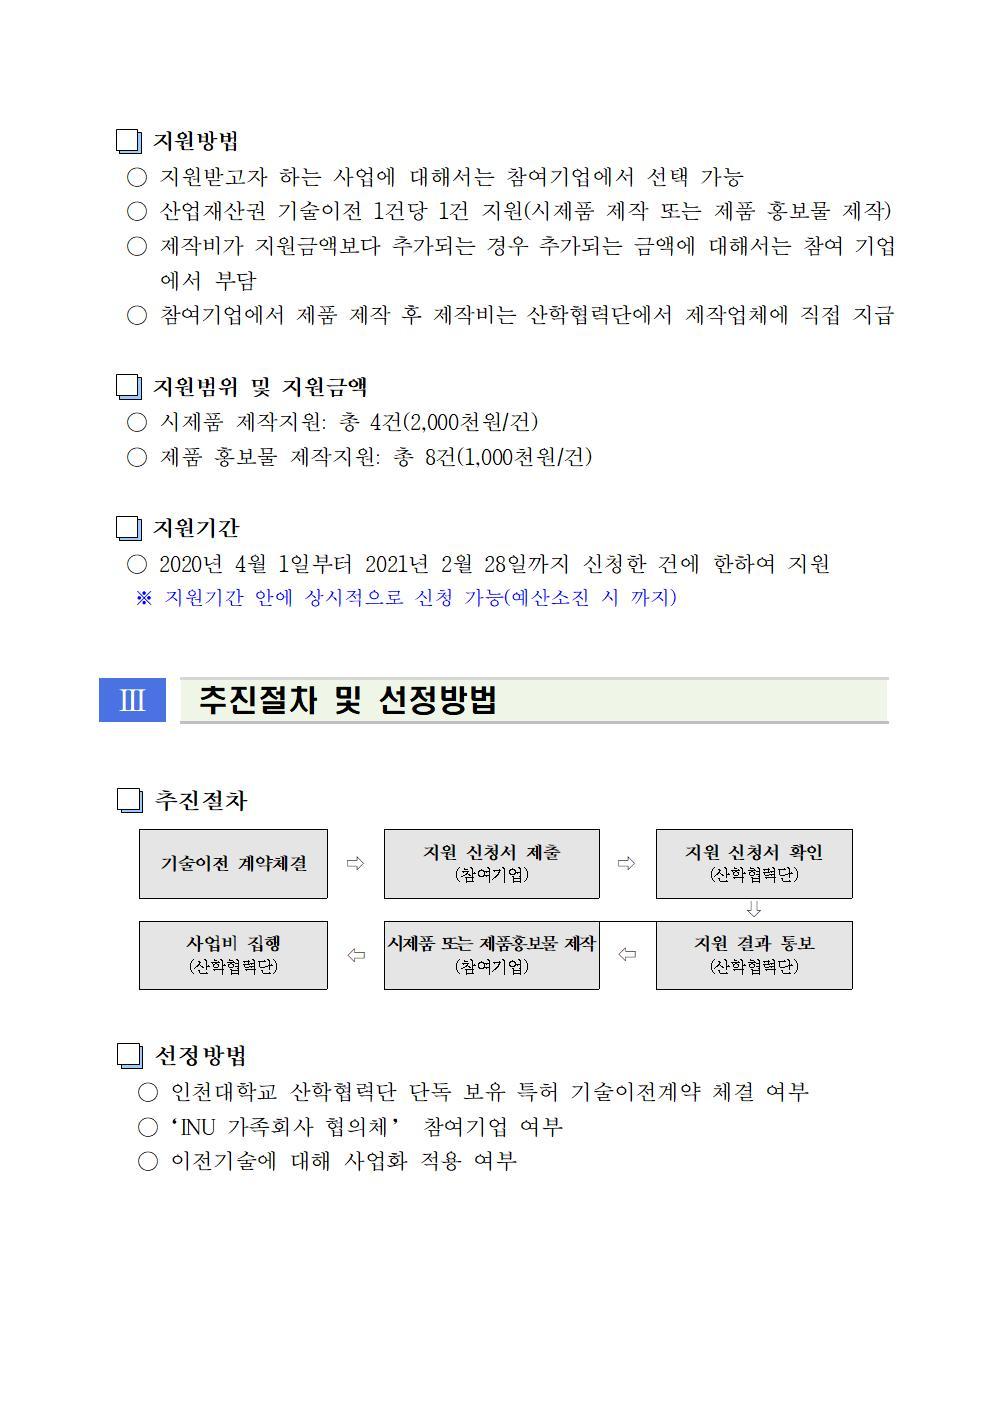 「INU 가족회사 협의체」 신기술 사업화 지원 계획 (안)002.jpg